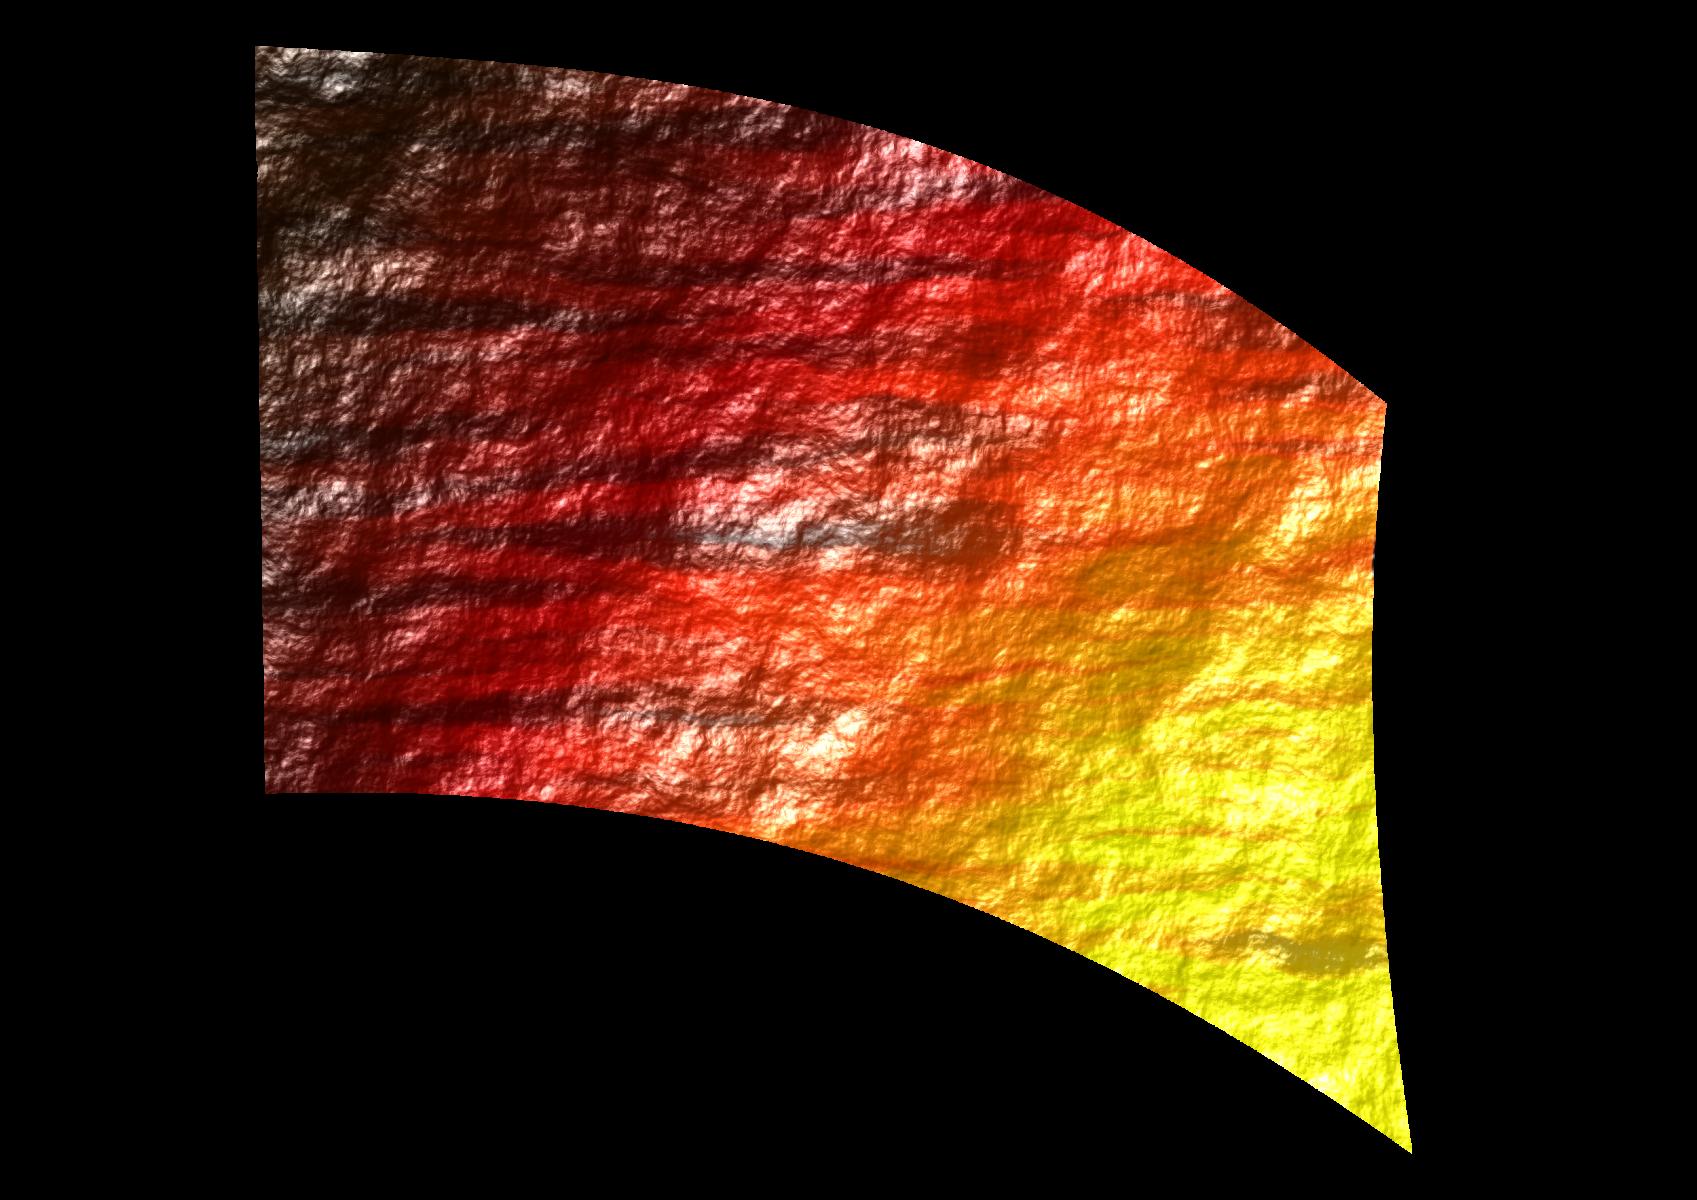 010604s - 36x54 Standard Orange-Yellow Rough Texture Ombre